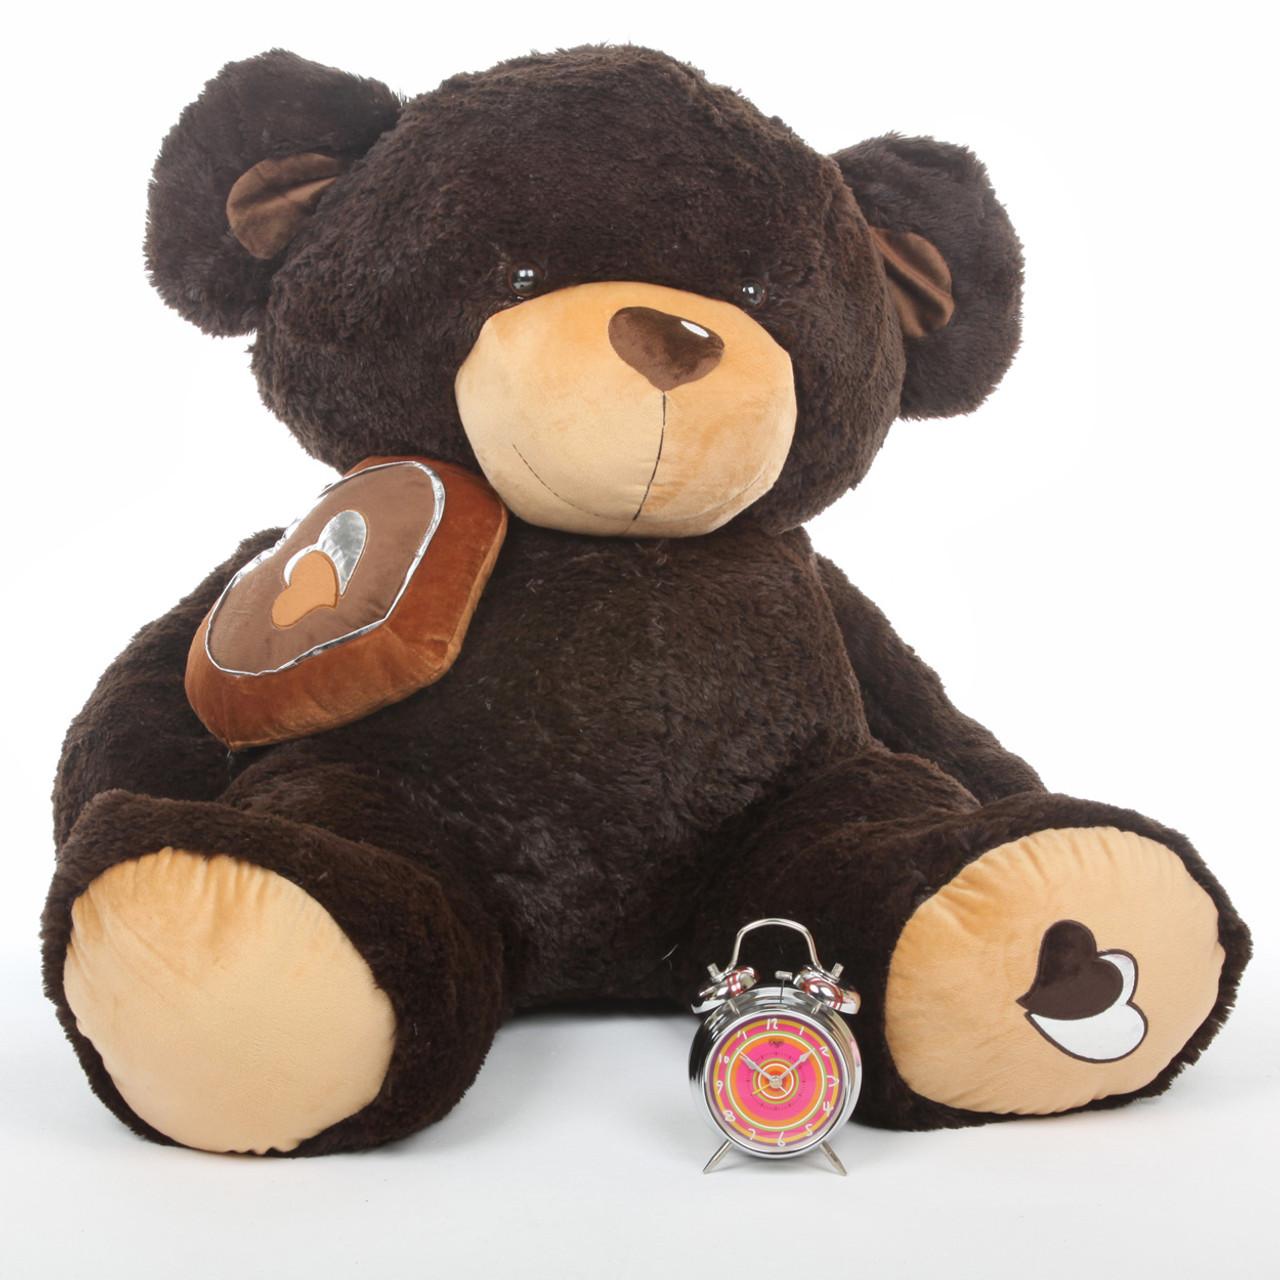 Sugar Pie Big Love chocolate brown teddy bear 47in